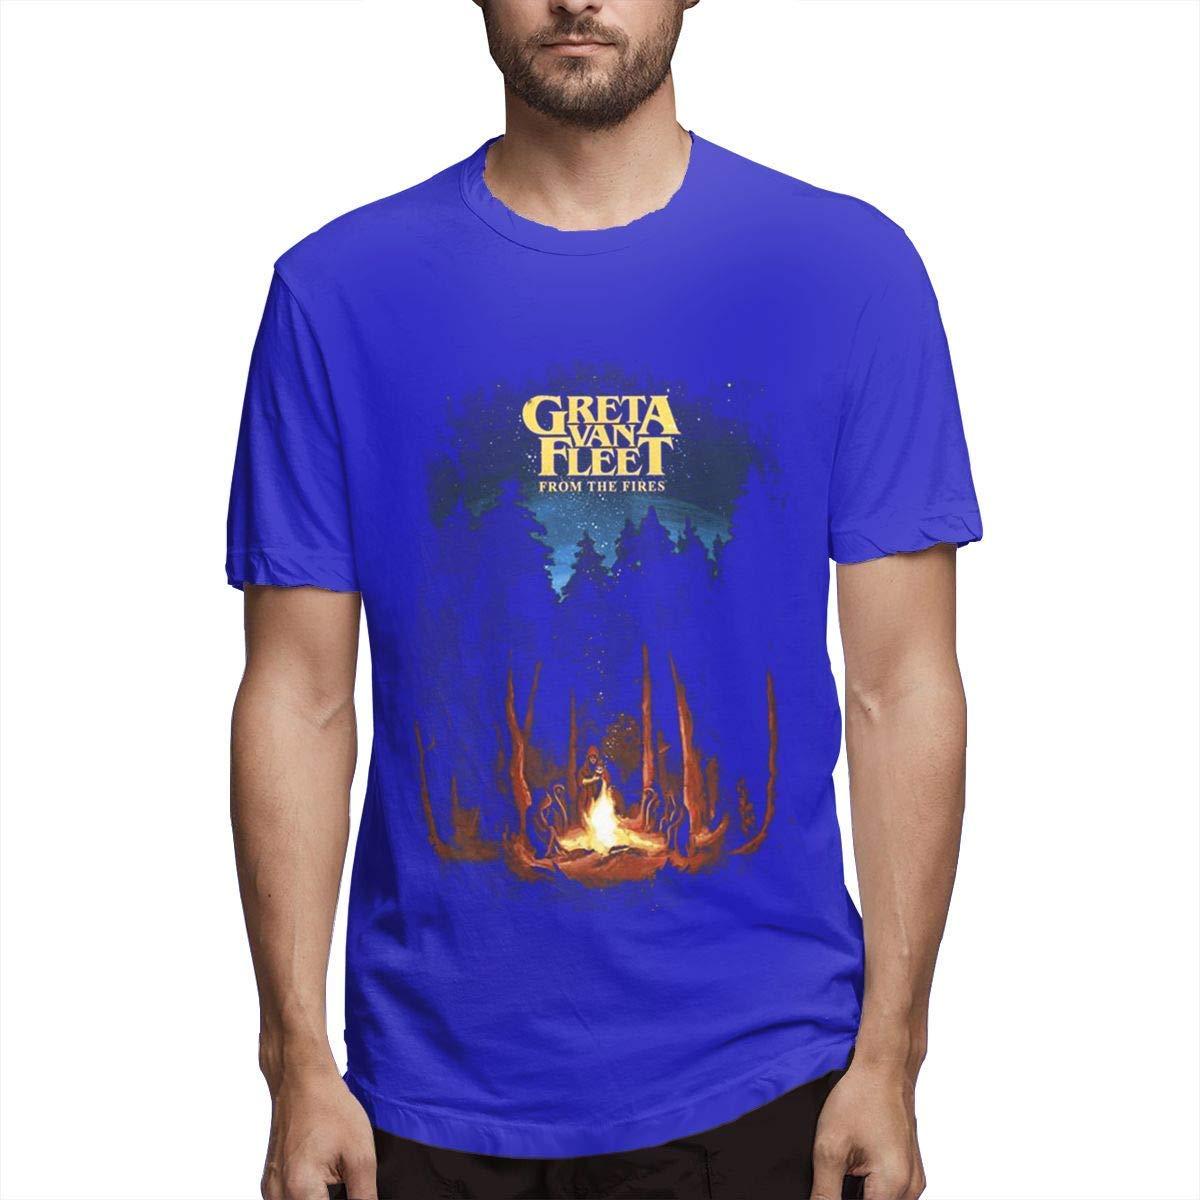 Slaoero Greta Van Fleet From The Fires Funny Summer Particular For Shirts